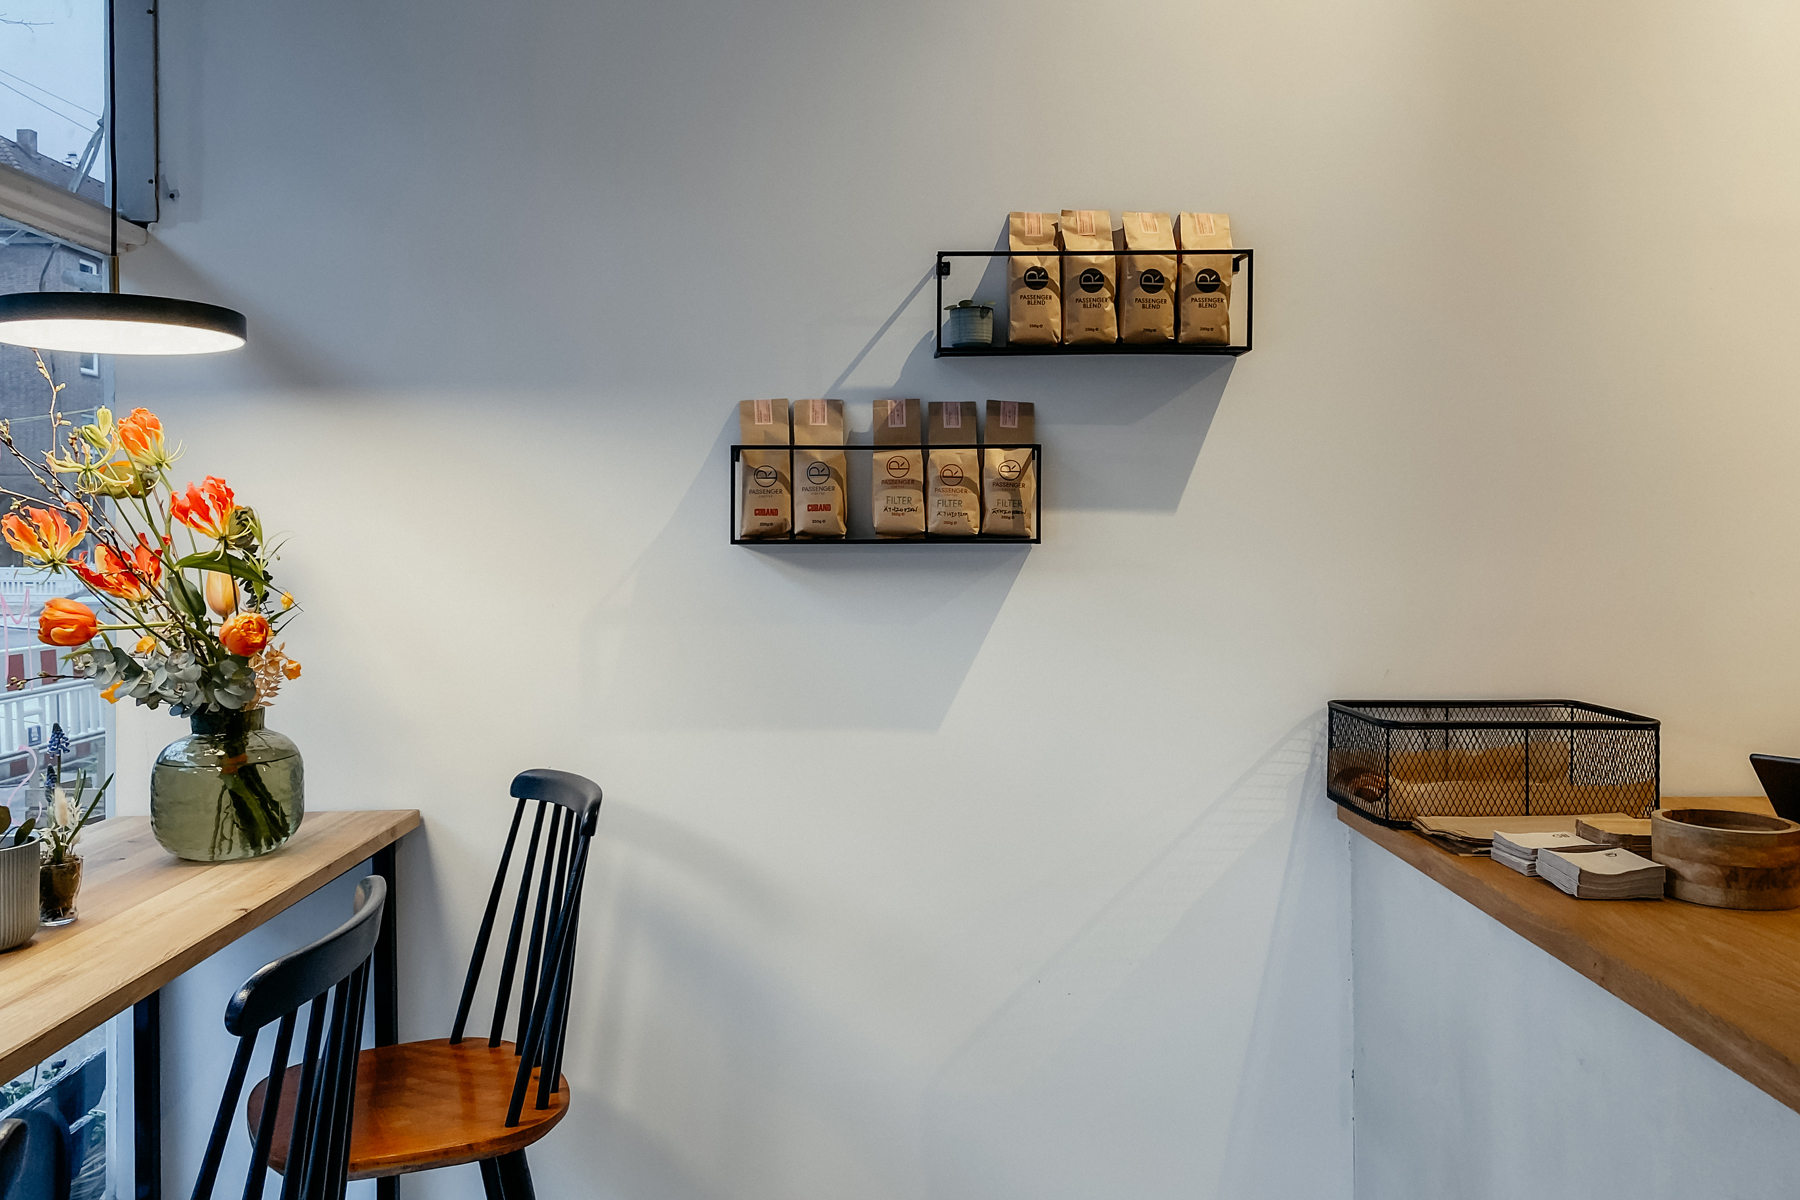 Geheimtipp Hamburg Café Ujote Espresso Bar Lilli Sprung 06